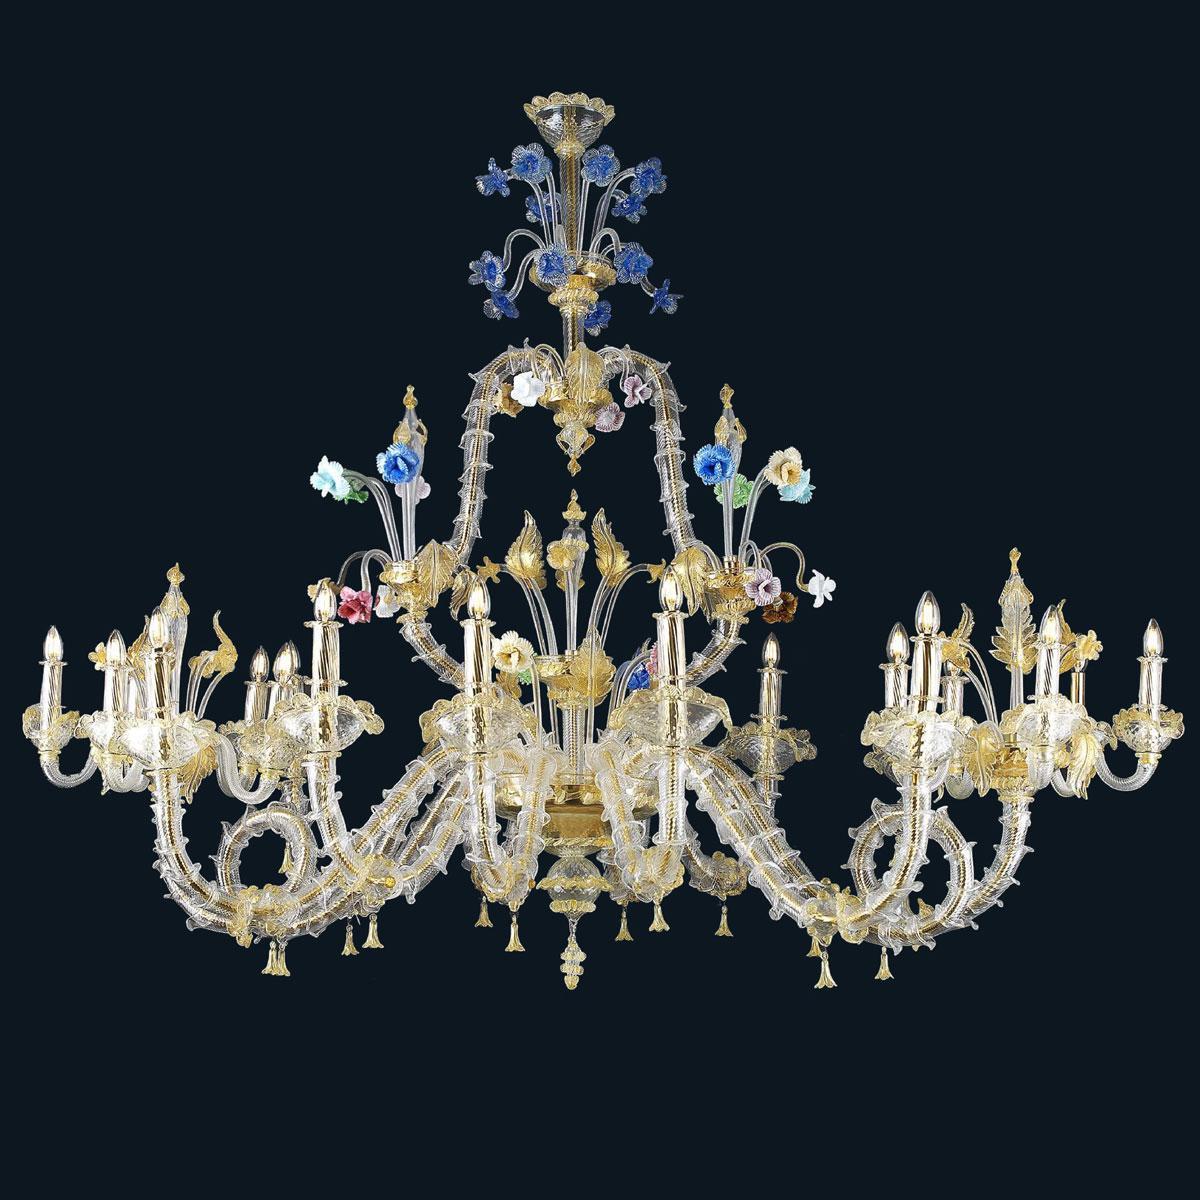 """Rea"" Murano glas Kronleuchter - 10+5+5 flammig - gold"